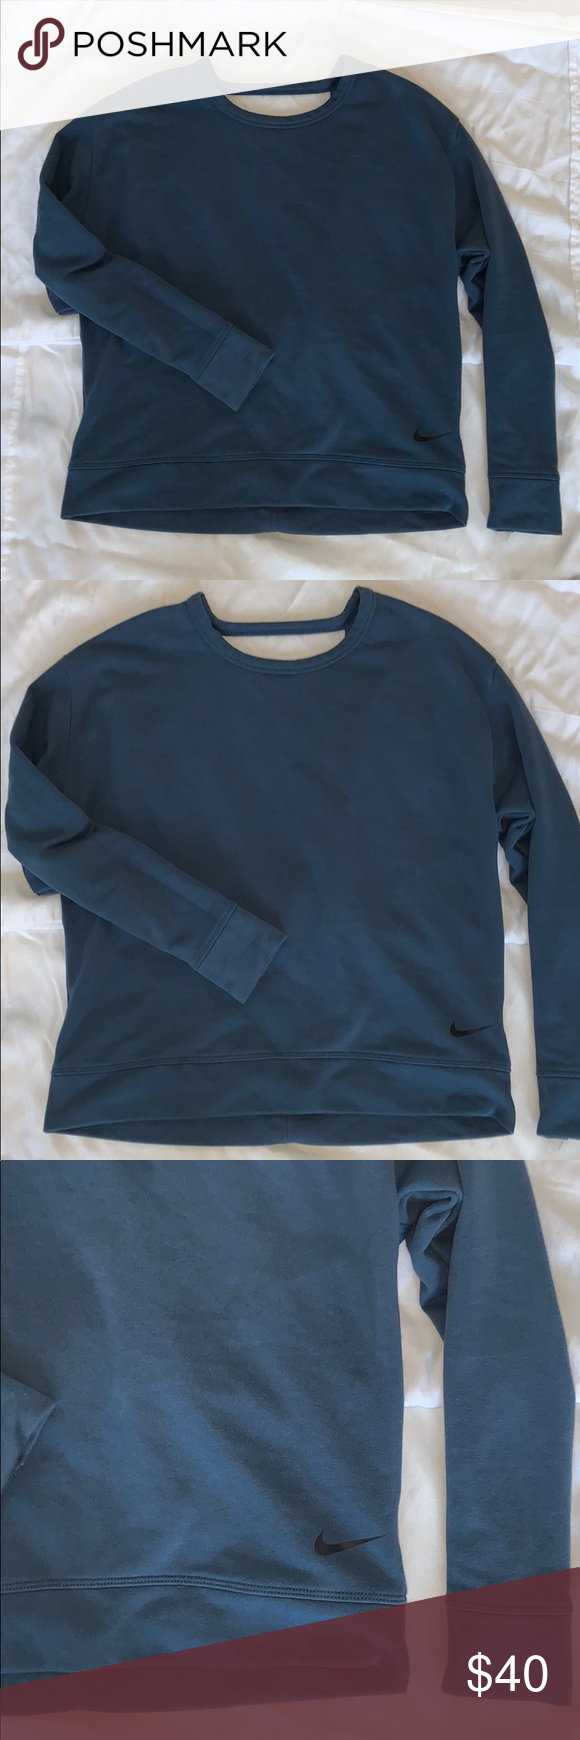 Nike Dri Fit Crewneck New In 2020 Clothes Design Nike Dri Fit Long Sleeve Tshirt Men [ 1740 x 580 Pixel ]